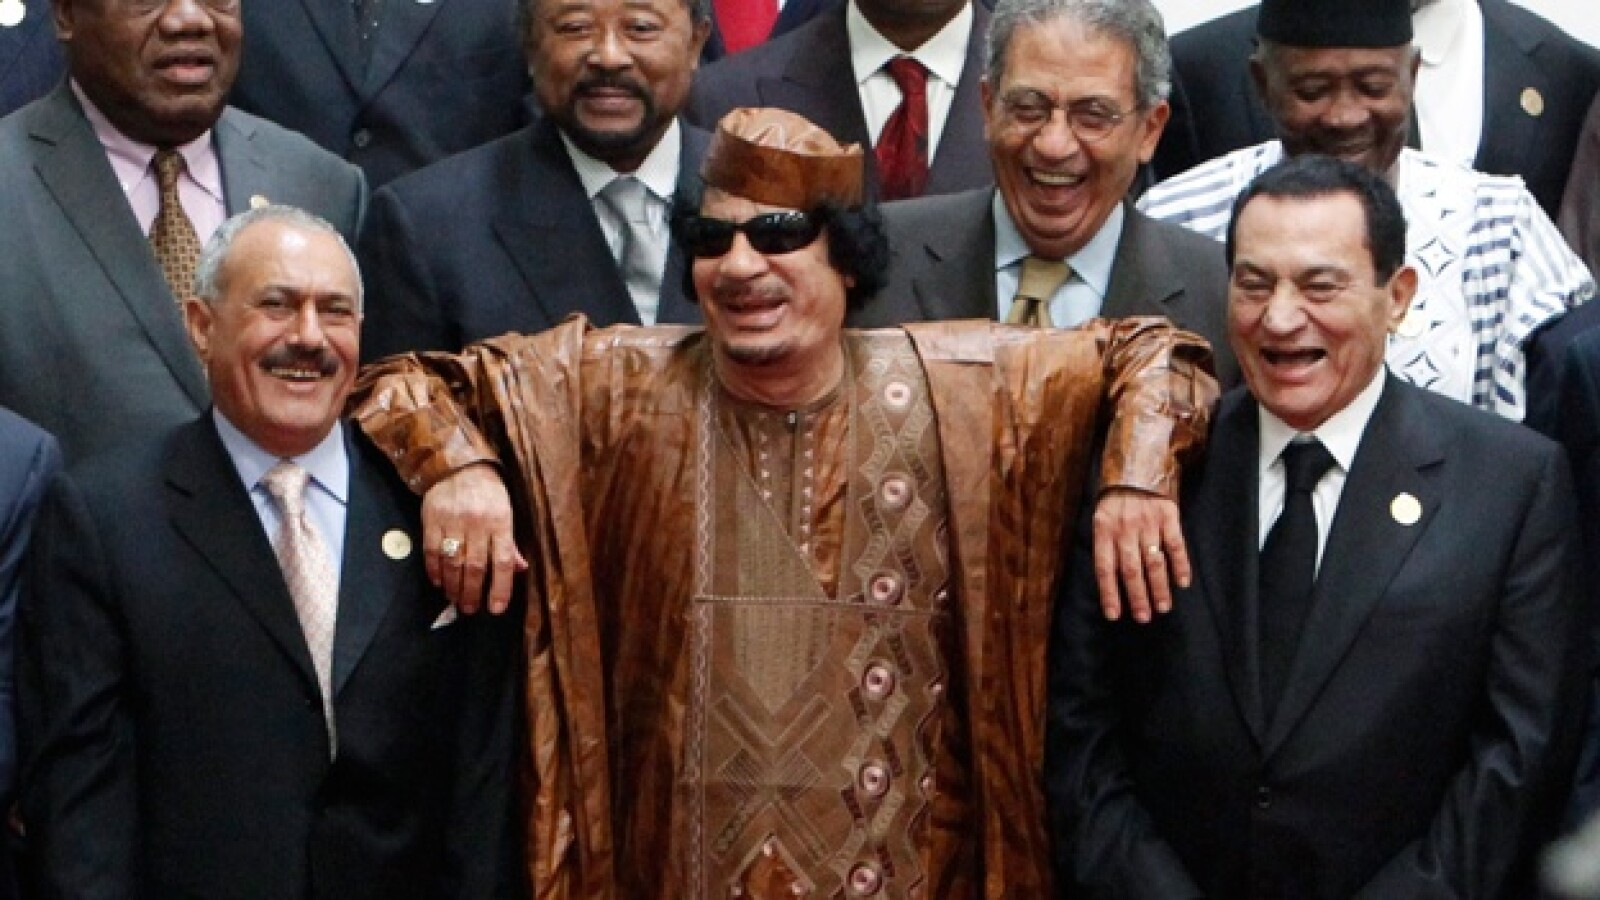 yemen, libia, egipto, mubarak, saleh, gadhafi